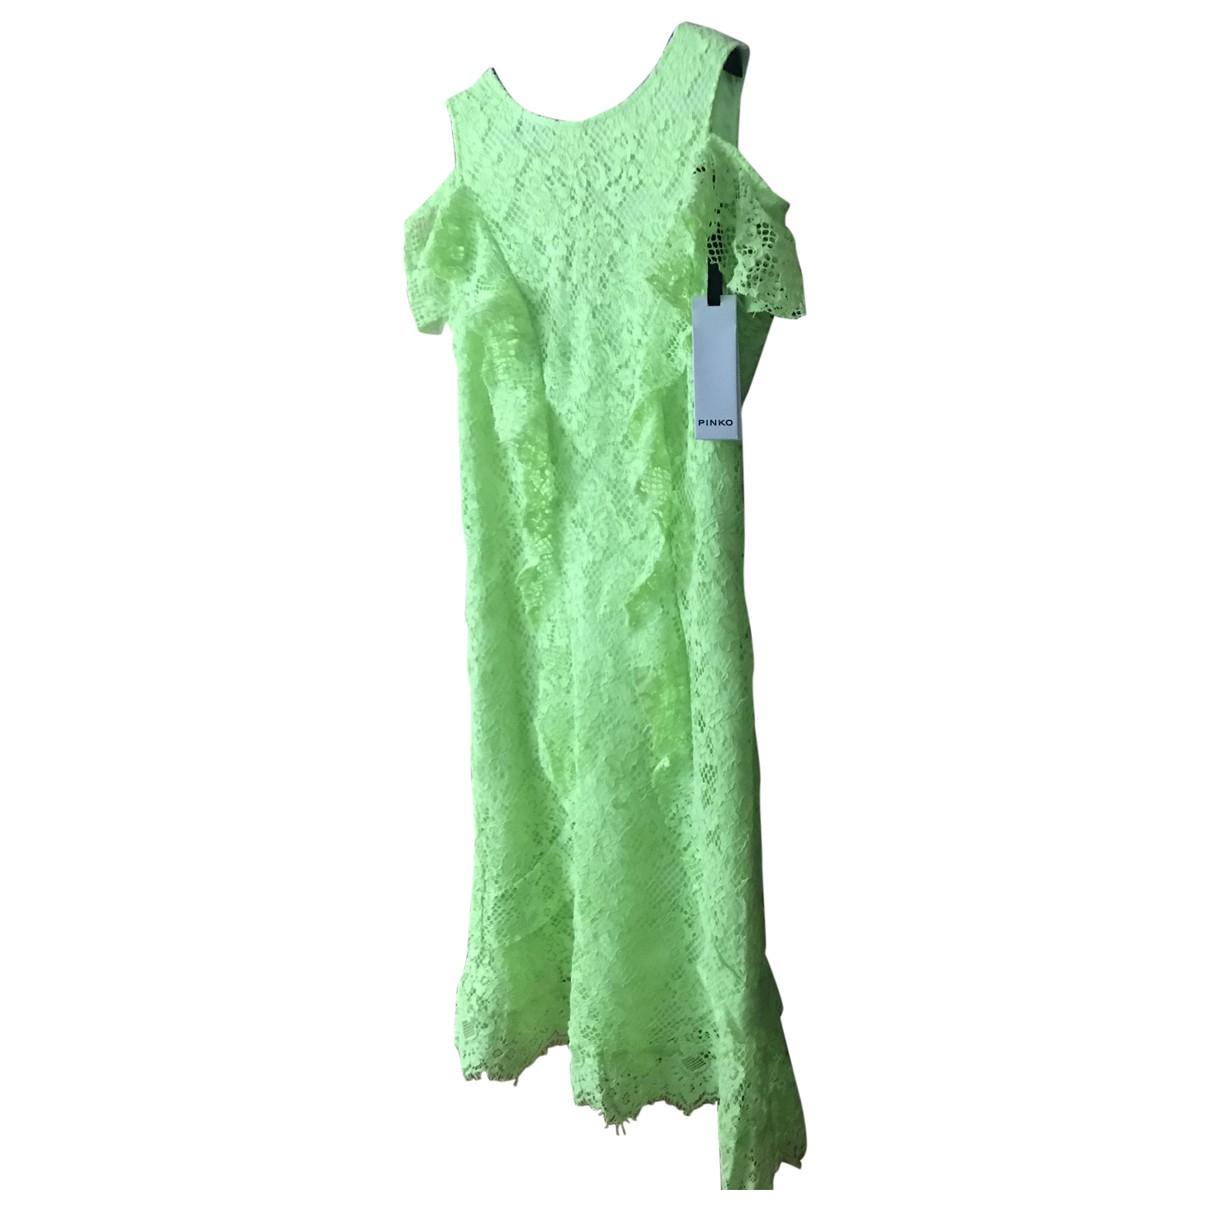 Patrizia Pepe \N Yellow Lace dress for Women 42 IT